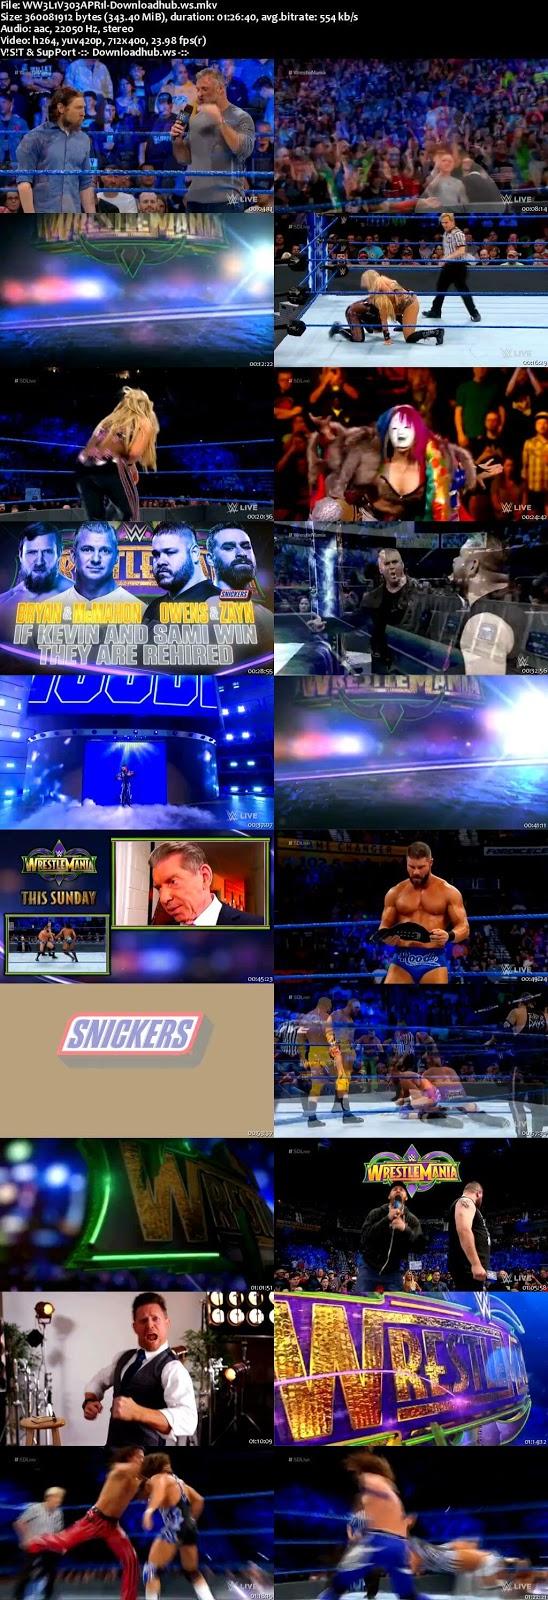 WWE Smackdown Live 03 April 2018 480p HDTV Download